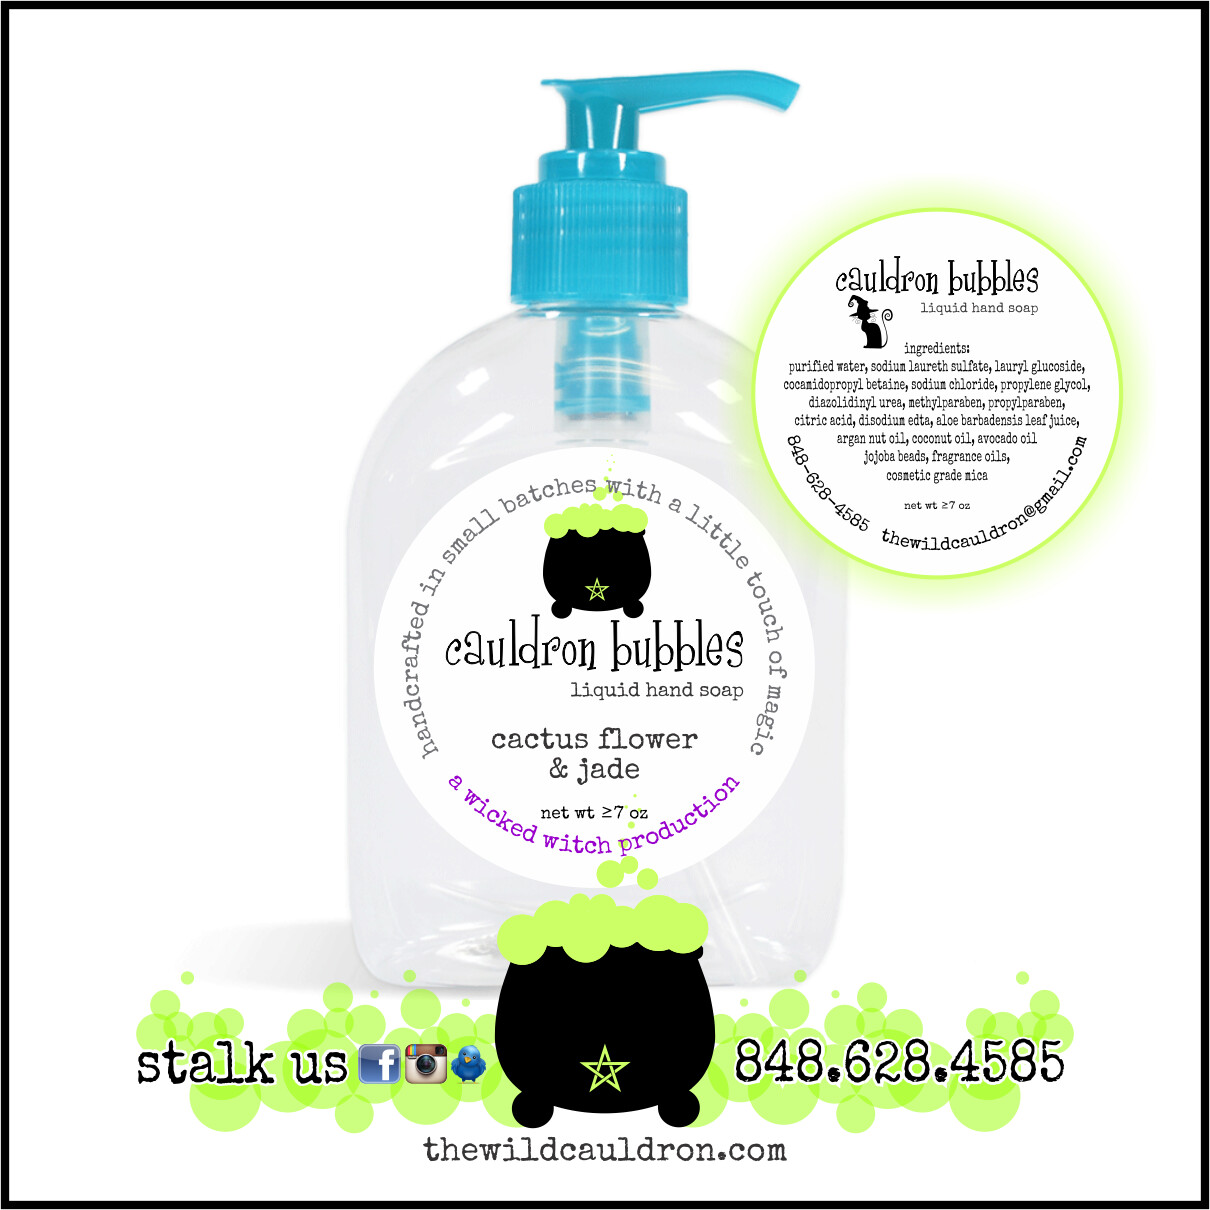 Cactus Flower and Jade Cauldron Bubbles Hand Soap